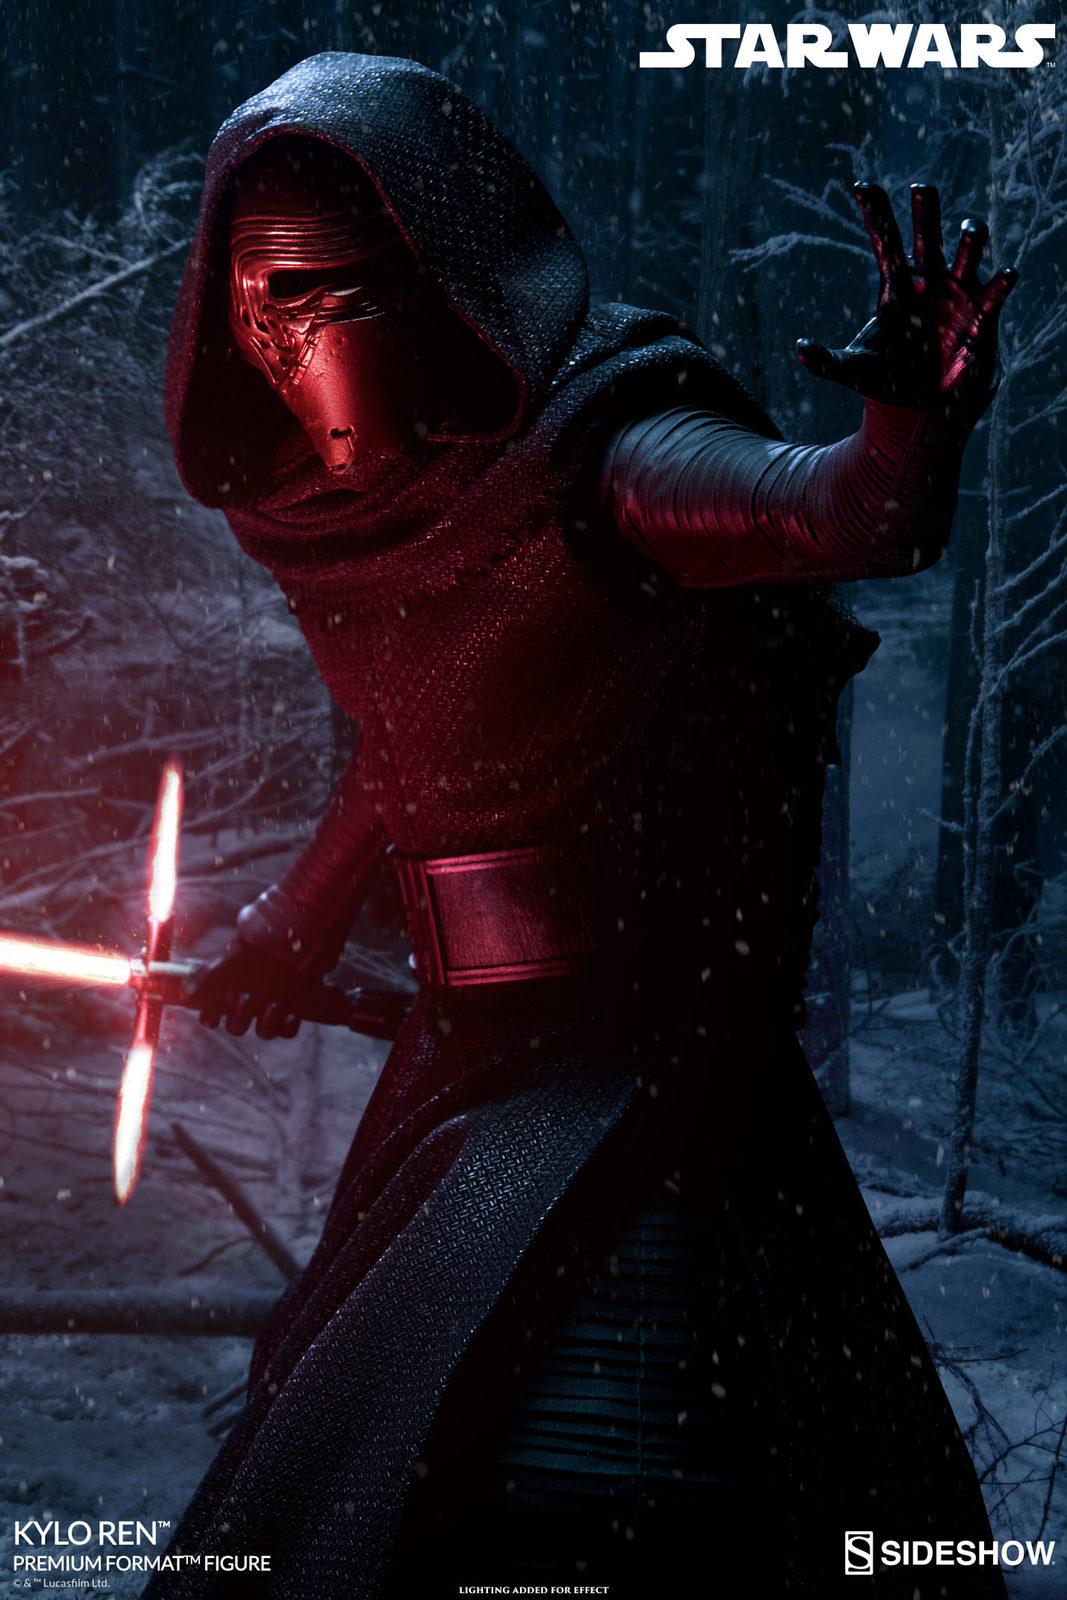 Star Wars: Kylo Ren - Premium Format Statue image